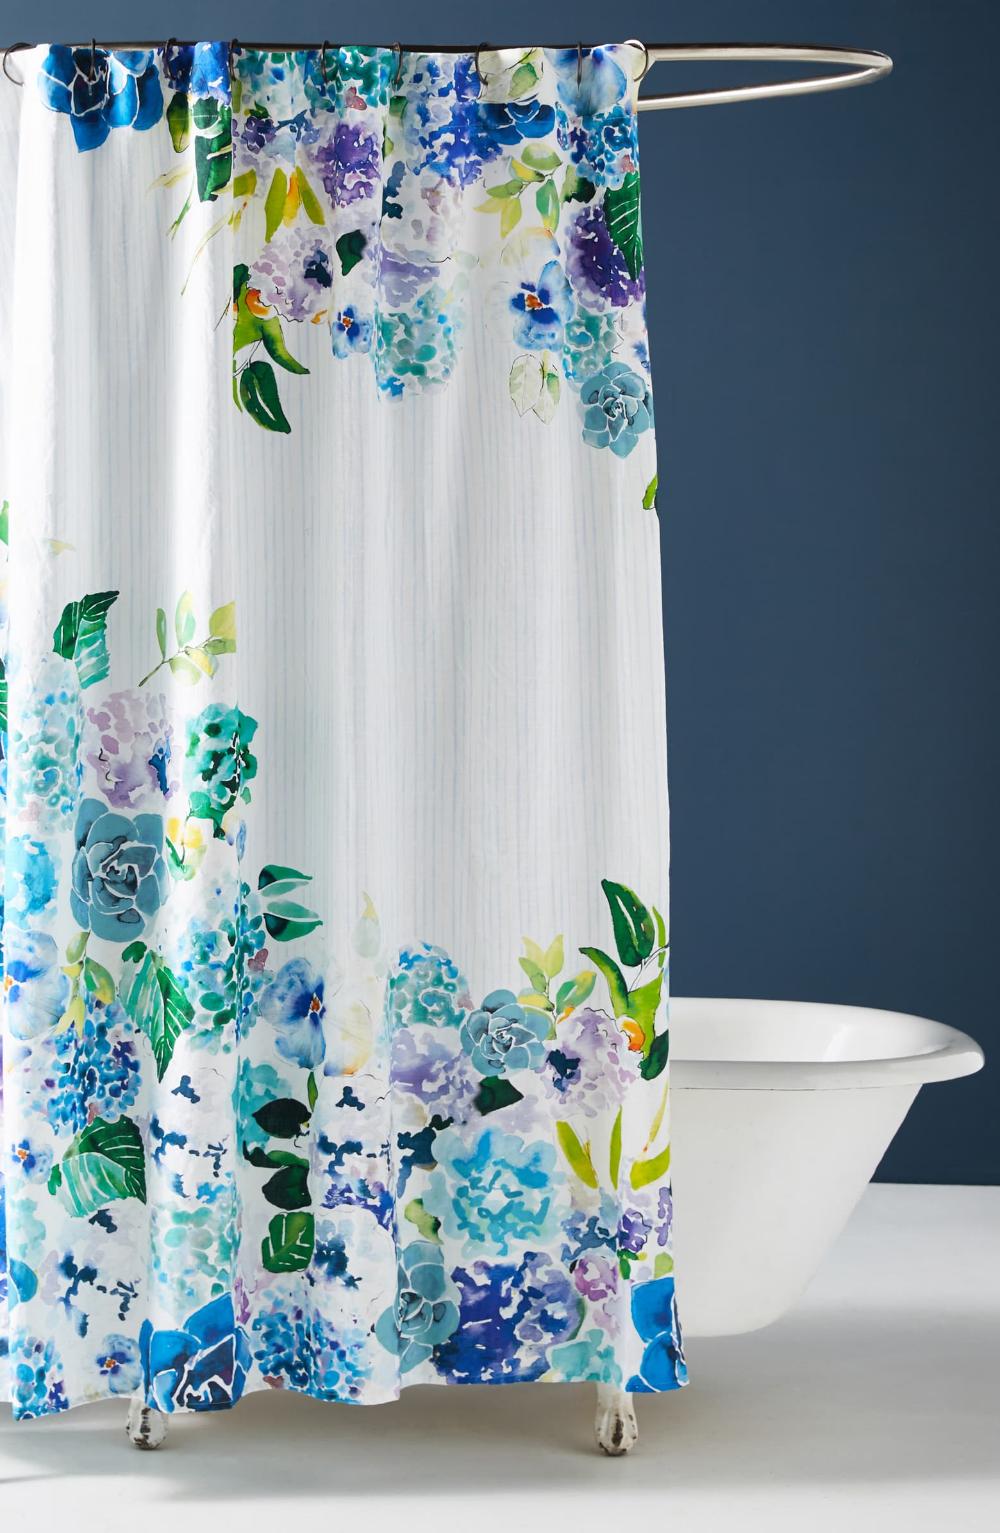 Anthropologie Sarah Hackinson Shower Curtain Nordstrom Unique Shower Curtain Shower Curtain Floral Shower Curtains